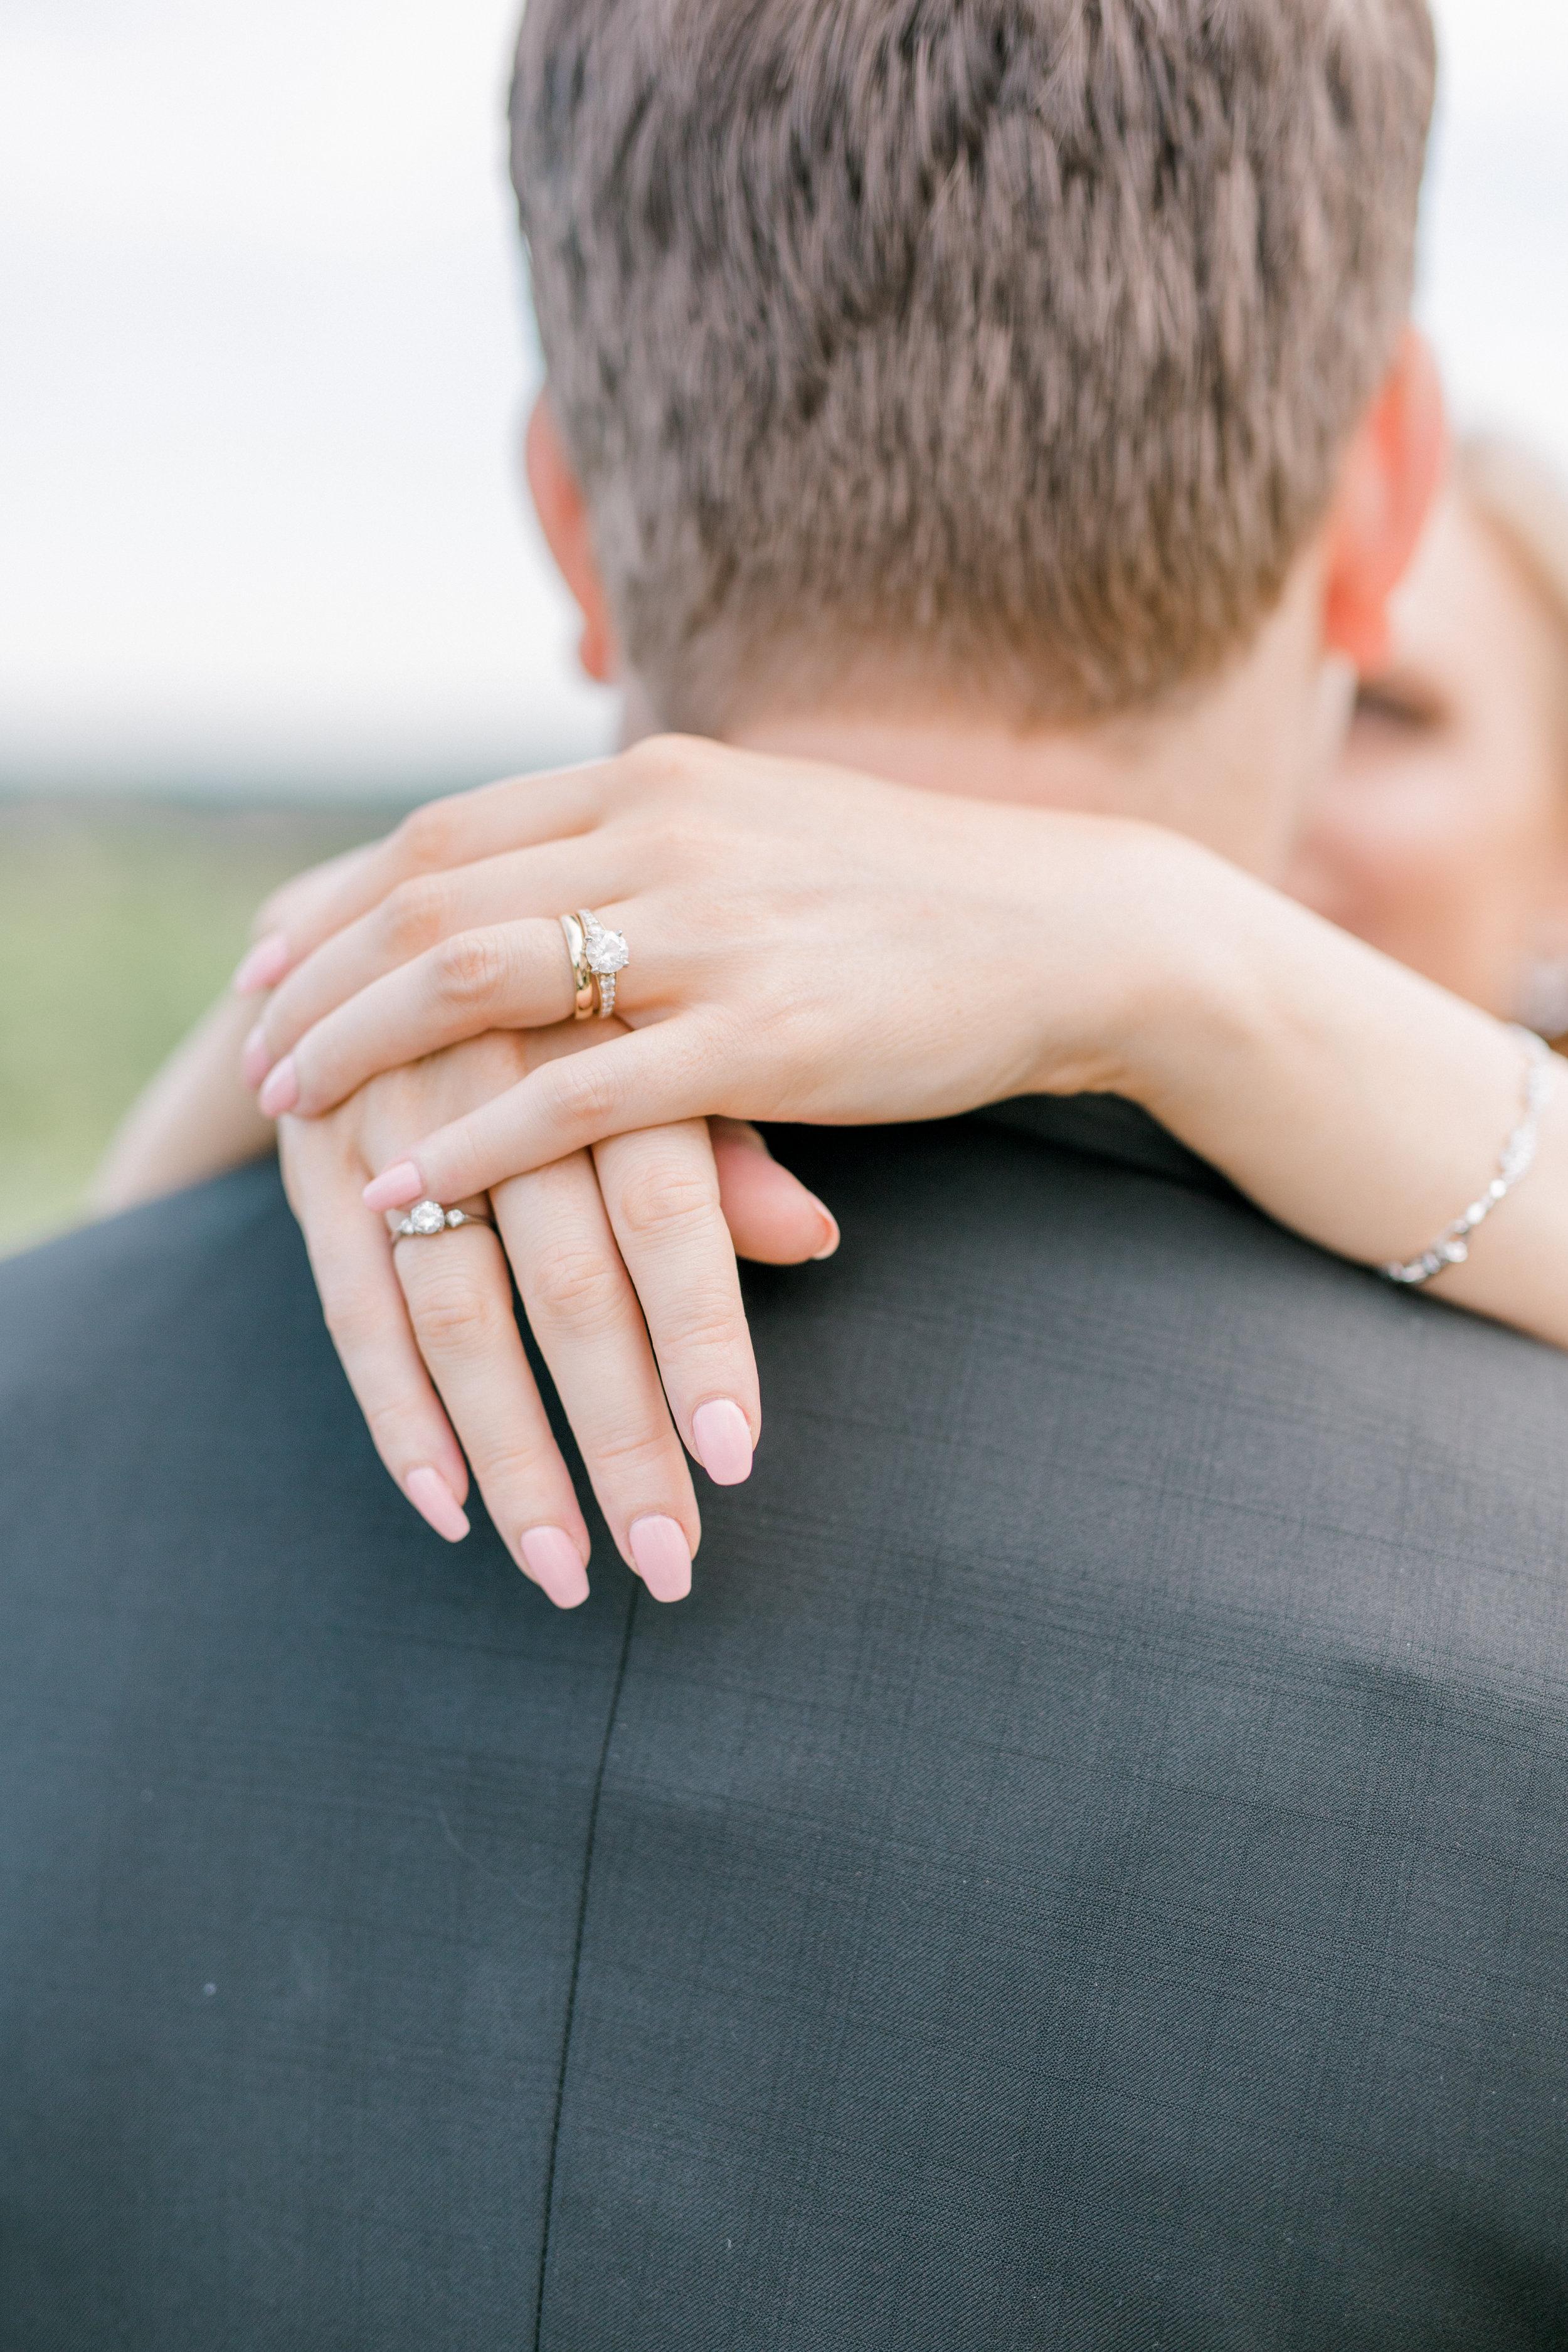 haley-richter-photography-summer-winery-vineyard-wedding-bride-jewelry-style-elegant-gold-diamond-pink-manicure